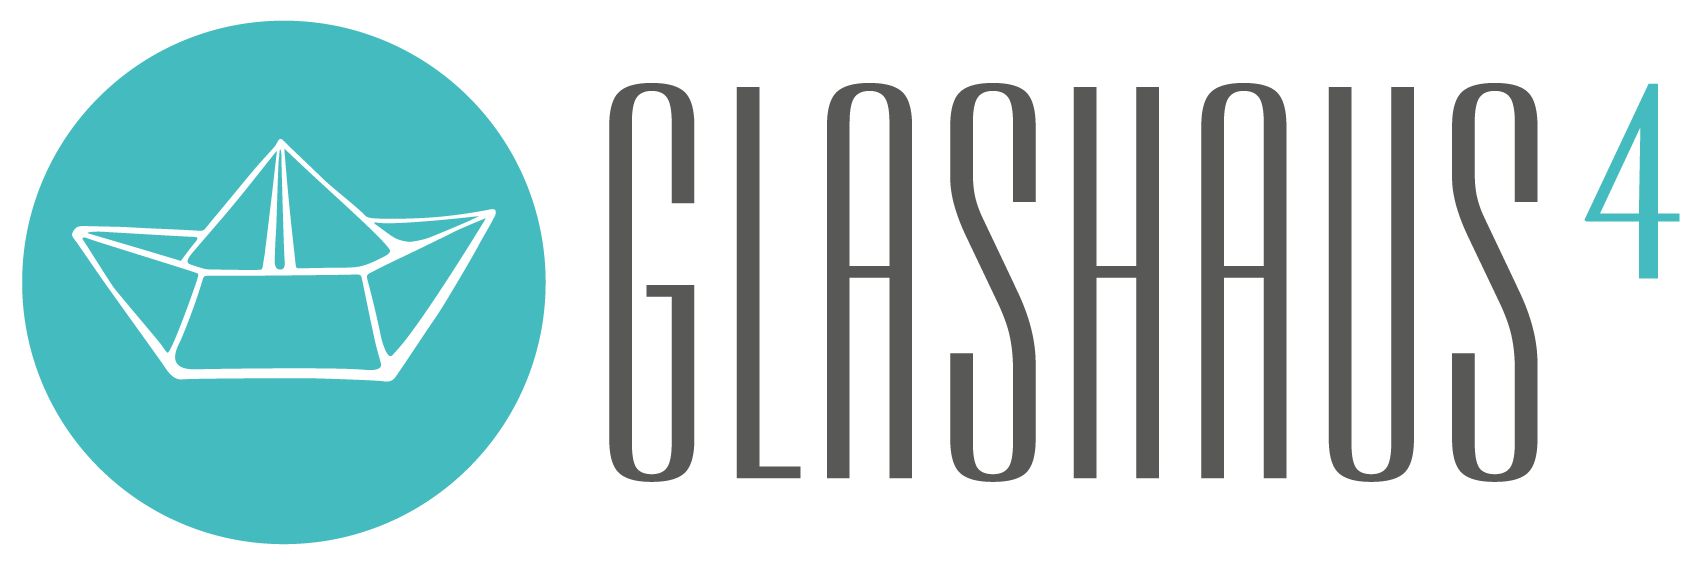 glashaus4 - Grafikbüro am Lech